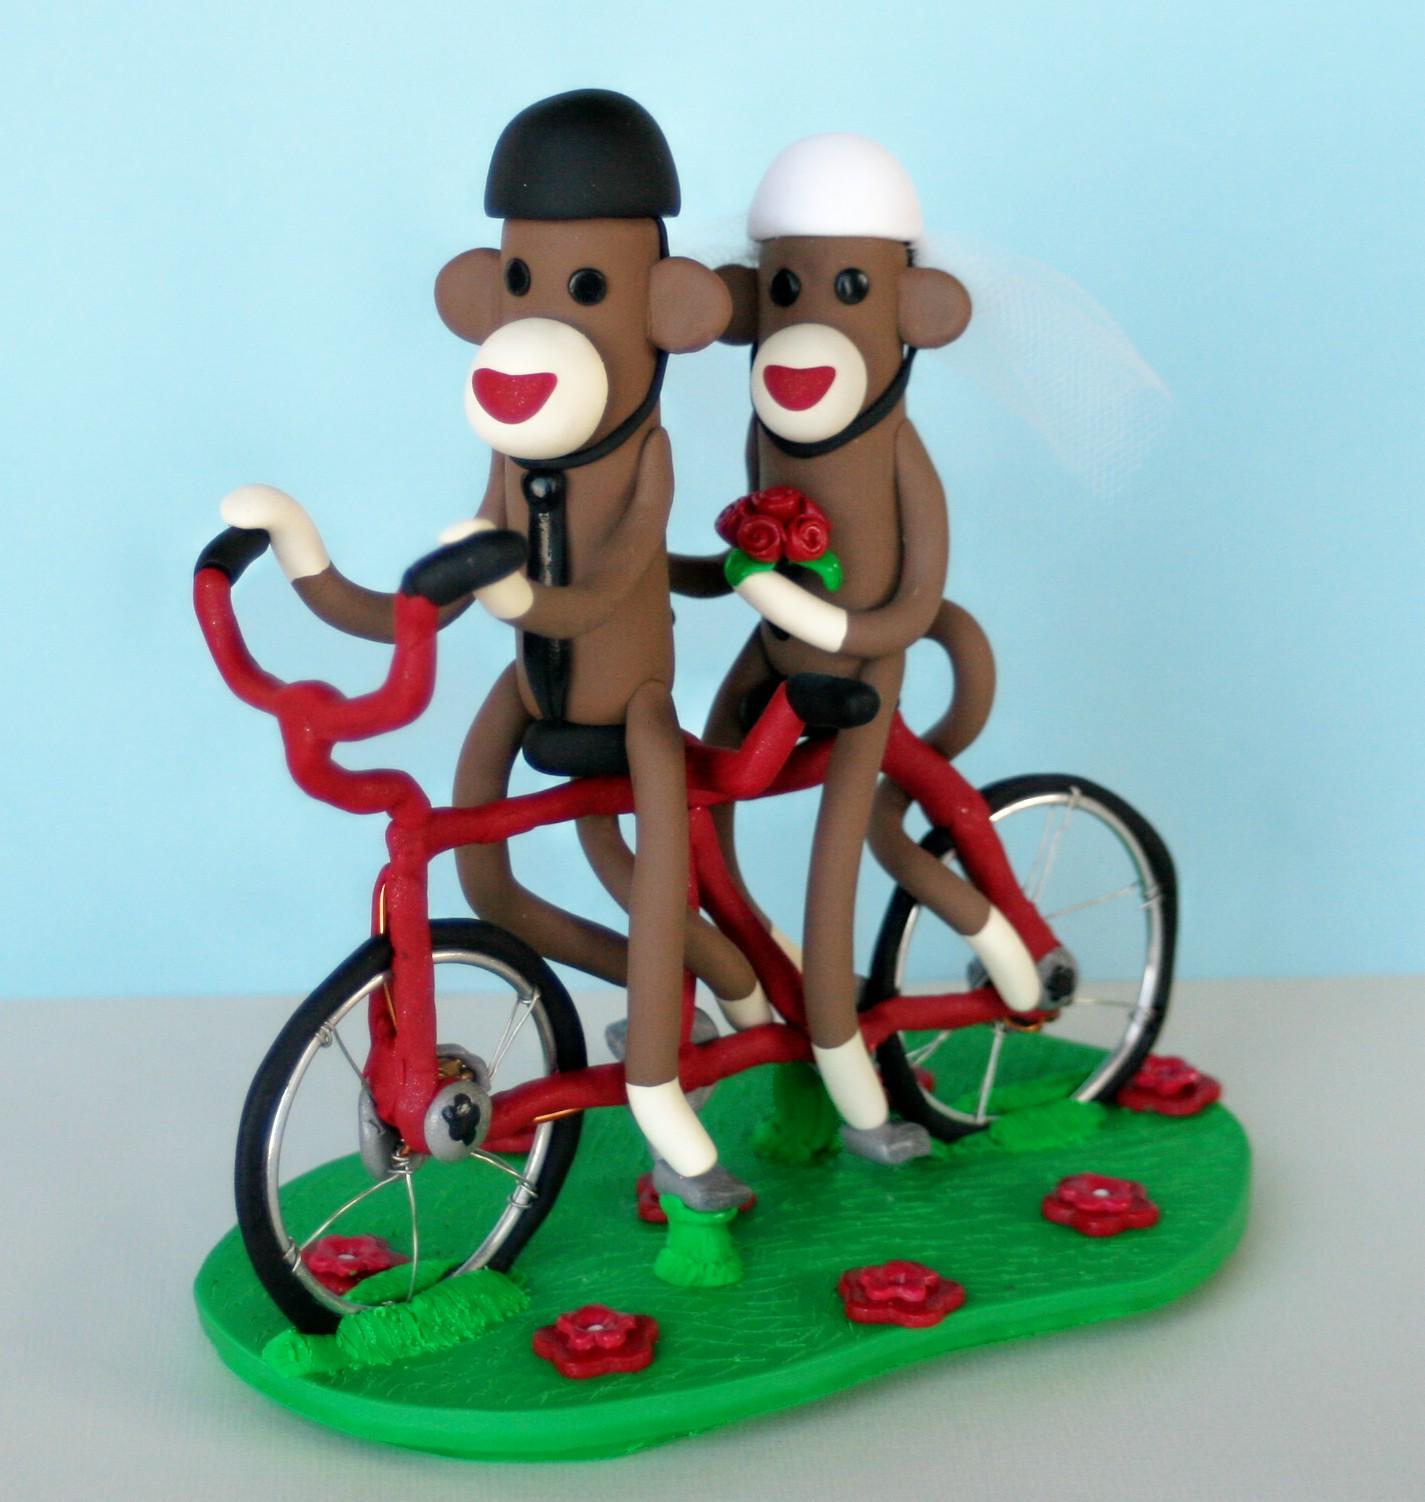 Spiritmama Art And Soul Sock Monkeys On A Tandem Bicycle Wedding Cake Topper